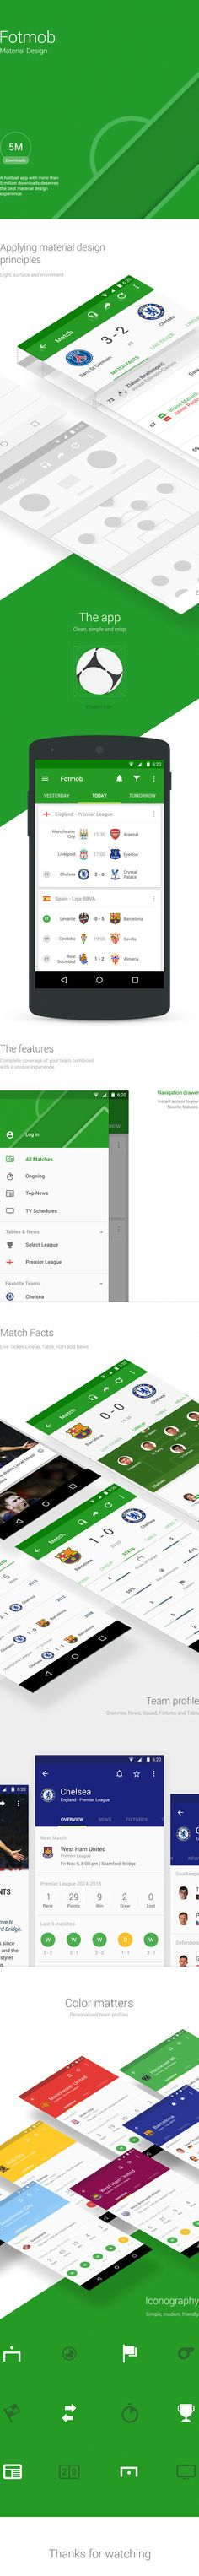 Football app #materialdesign